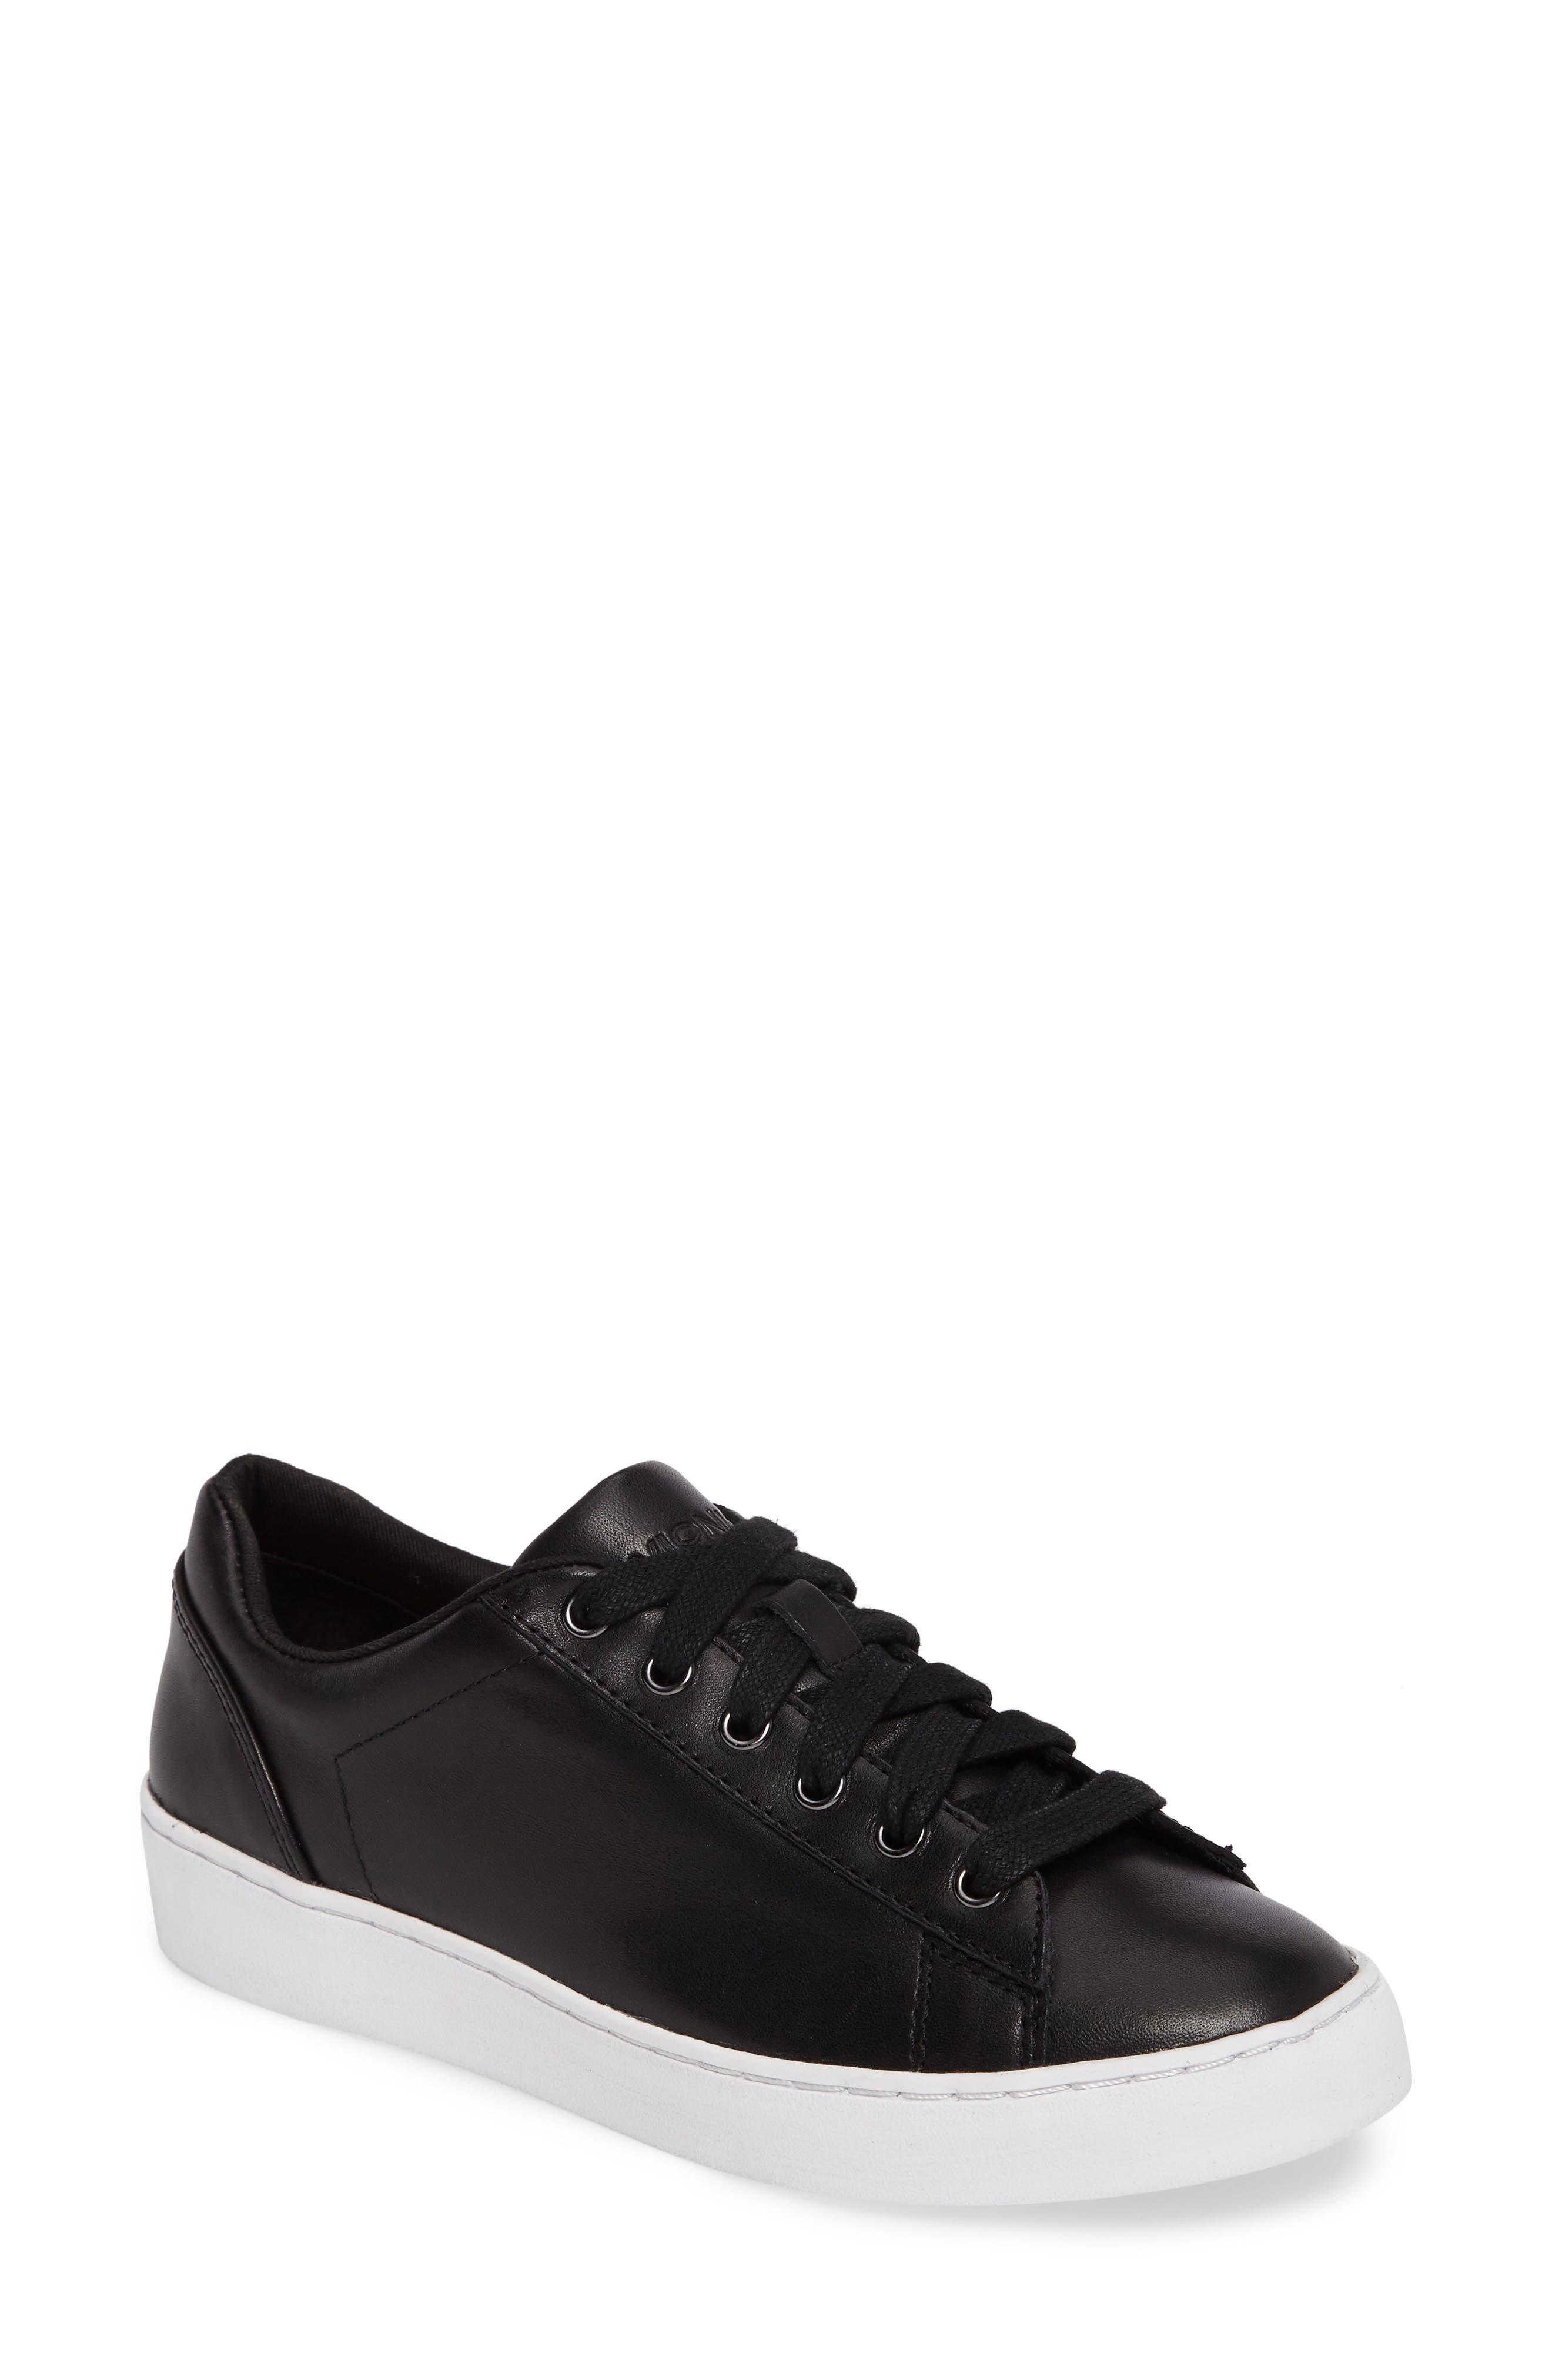 Splendid Syra Sneaker,                             Main thumbnail 1, color,                             Black Leather